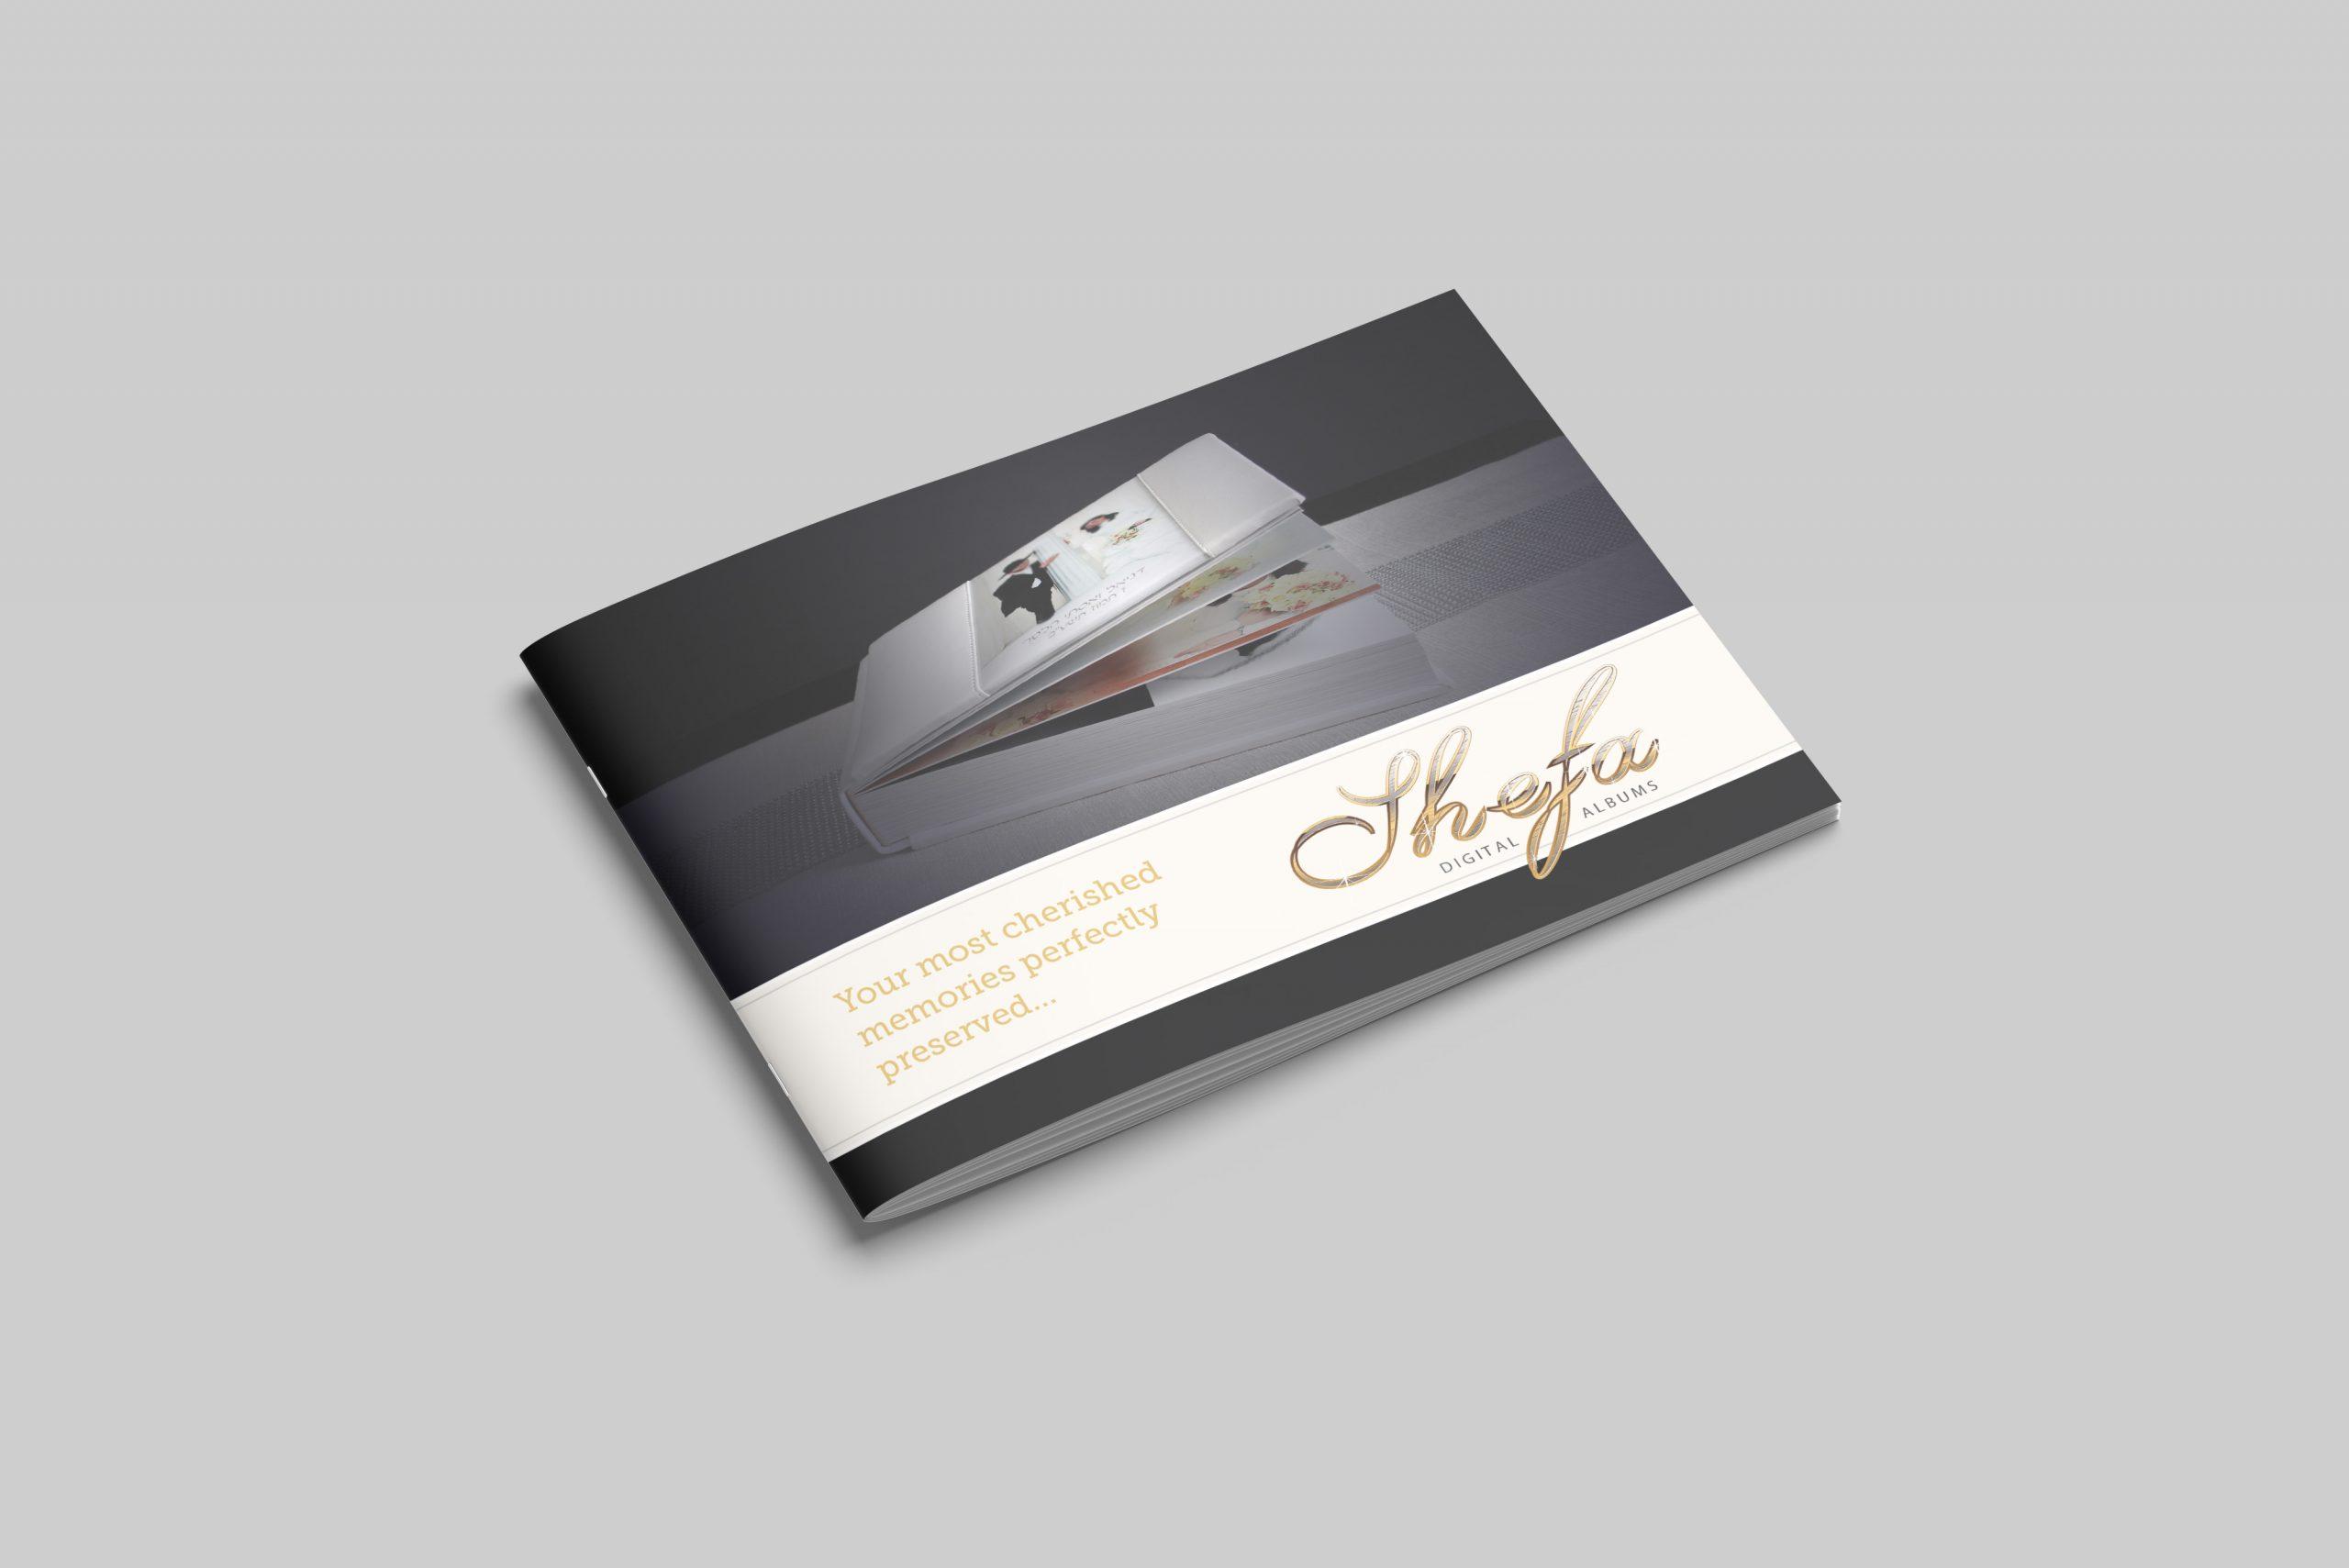 shefa-digital-albums